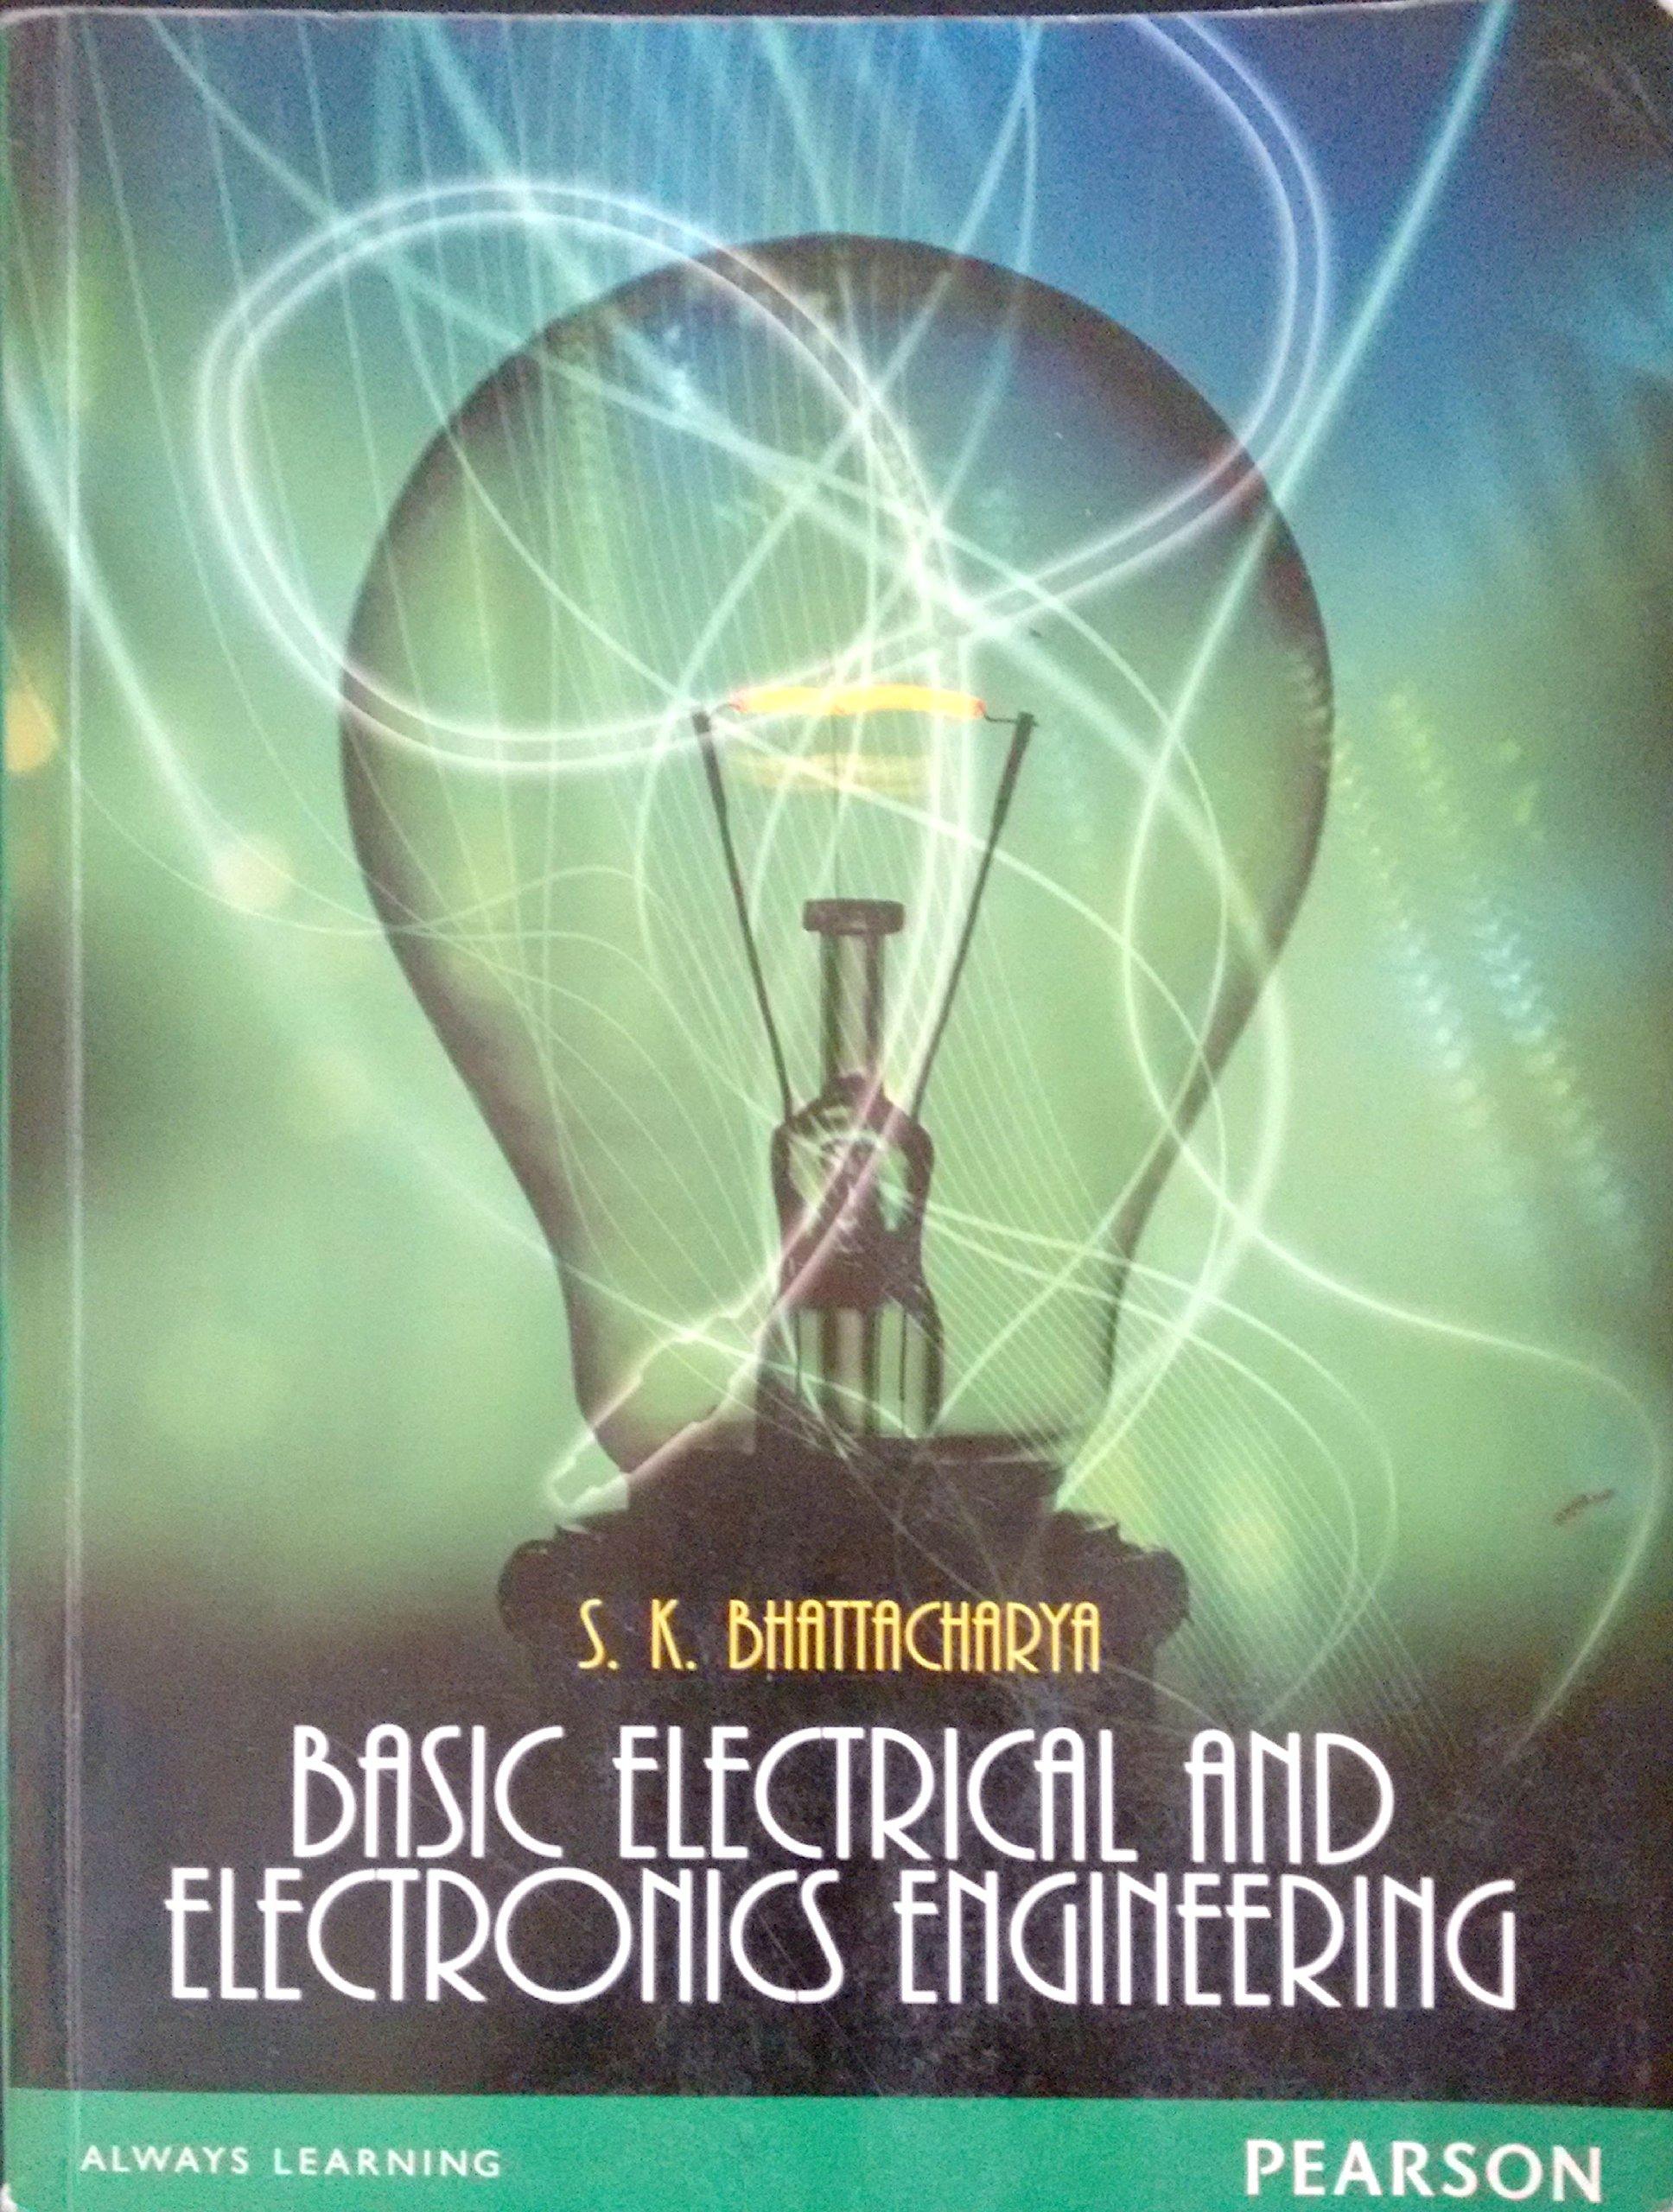 bhattacharya basic electrical engineering book